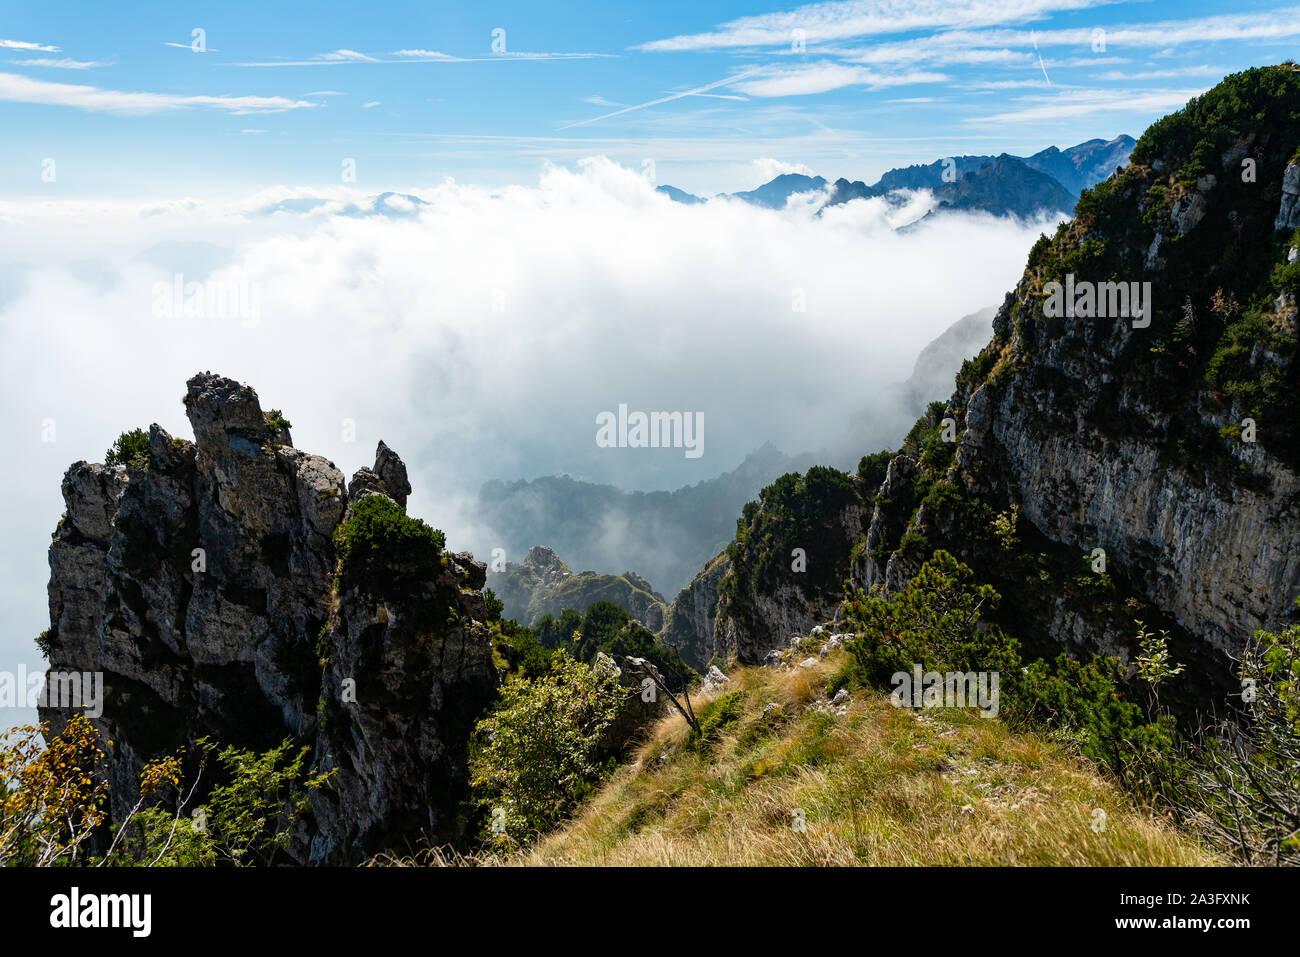 Monte Pasubio - Strada Delle cinquantadue 52 gallerie Foto de stock